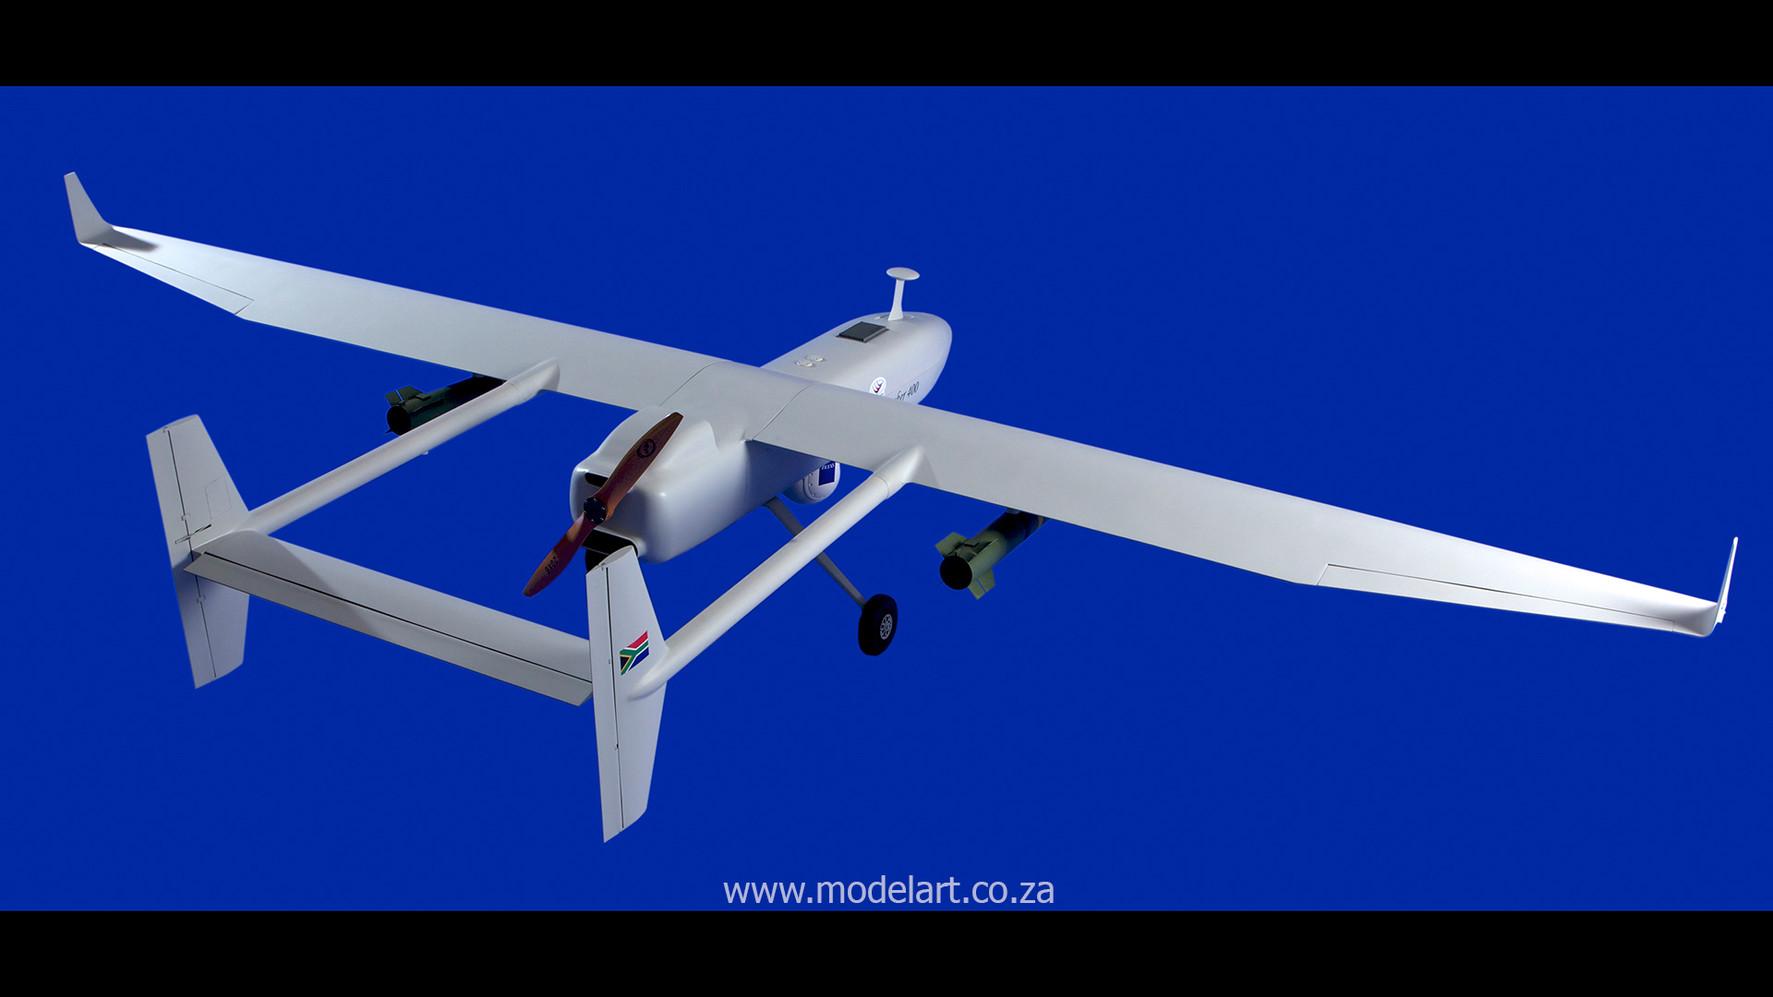 Architectural-Scale-Model-Engineering-Denel Seeker-5